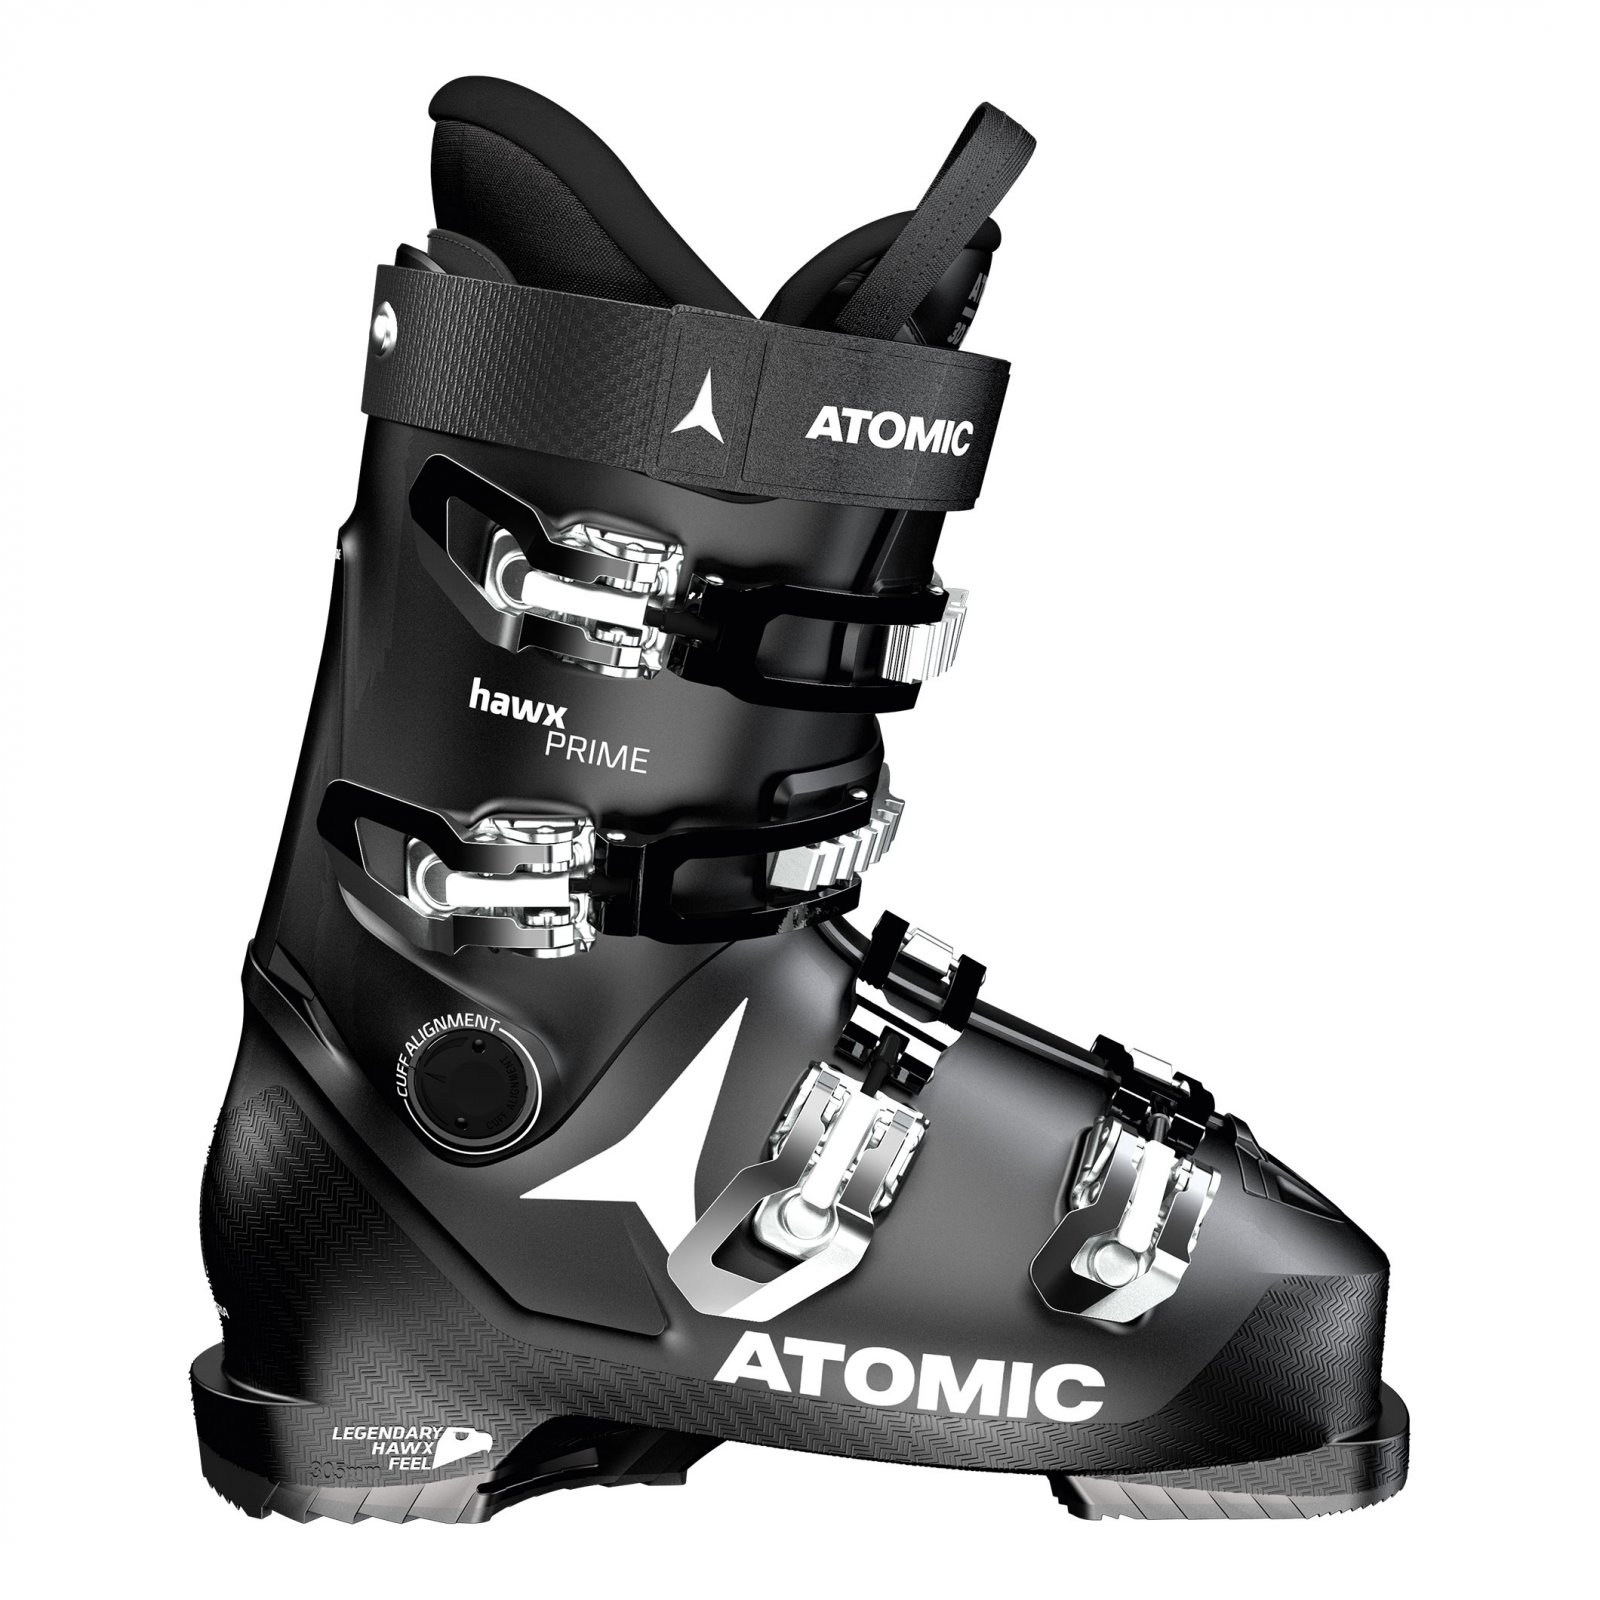 2022 Atomic Hawx Prime W Women's Ski Boots